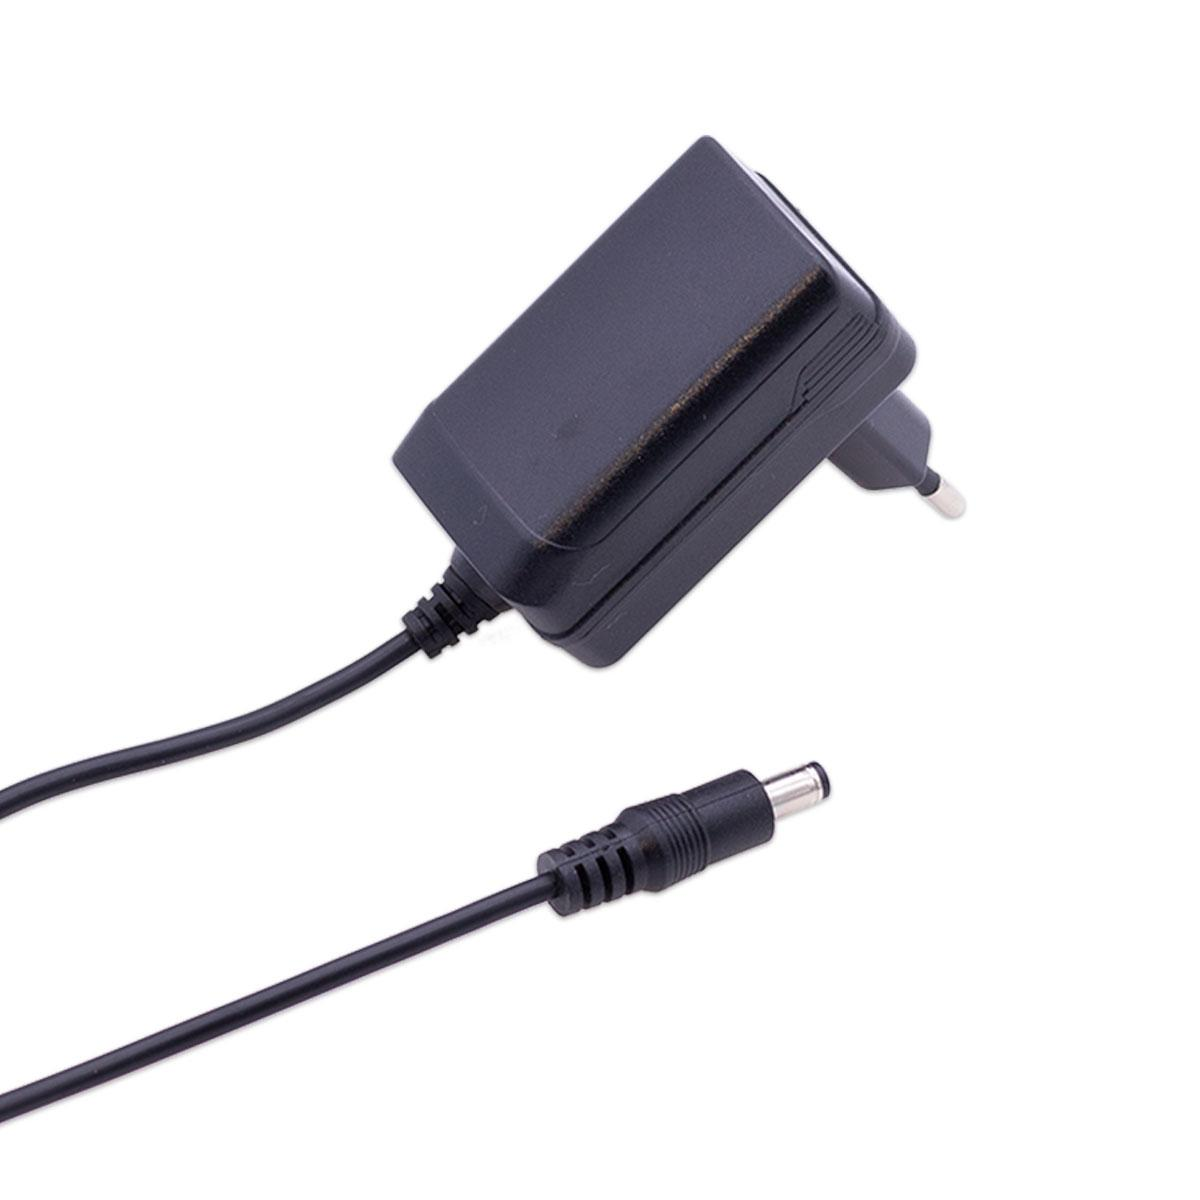 Steckernetzteil 12W 12V 1A Hohlstecker 5.5/2.1mm EU-Plug Festspannung